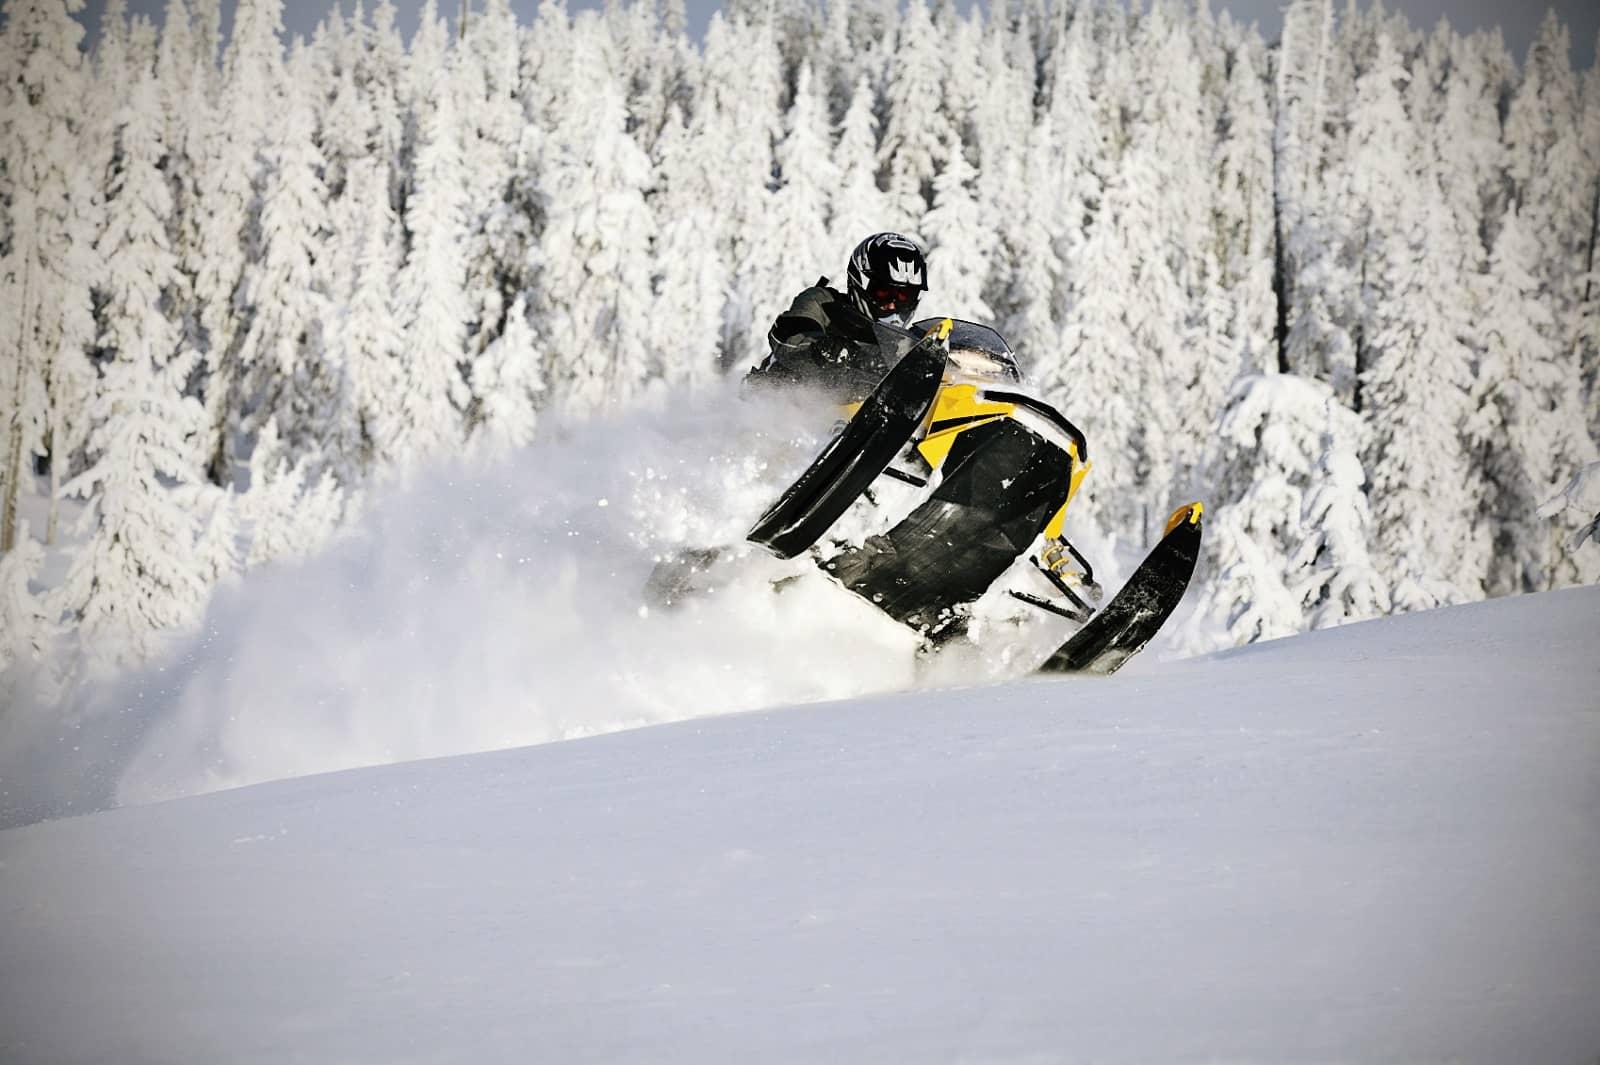 Snowmobile jumping through powdery snow